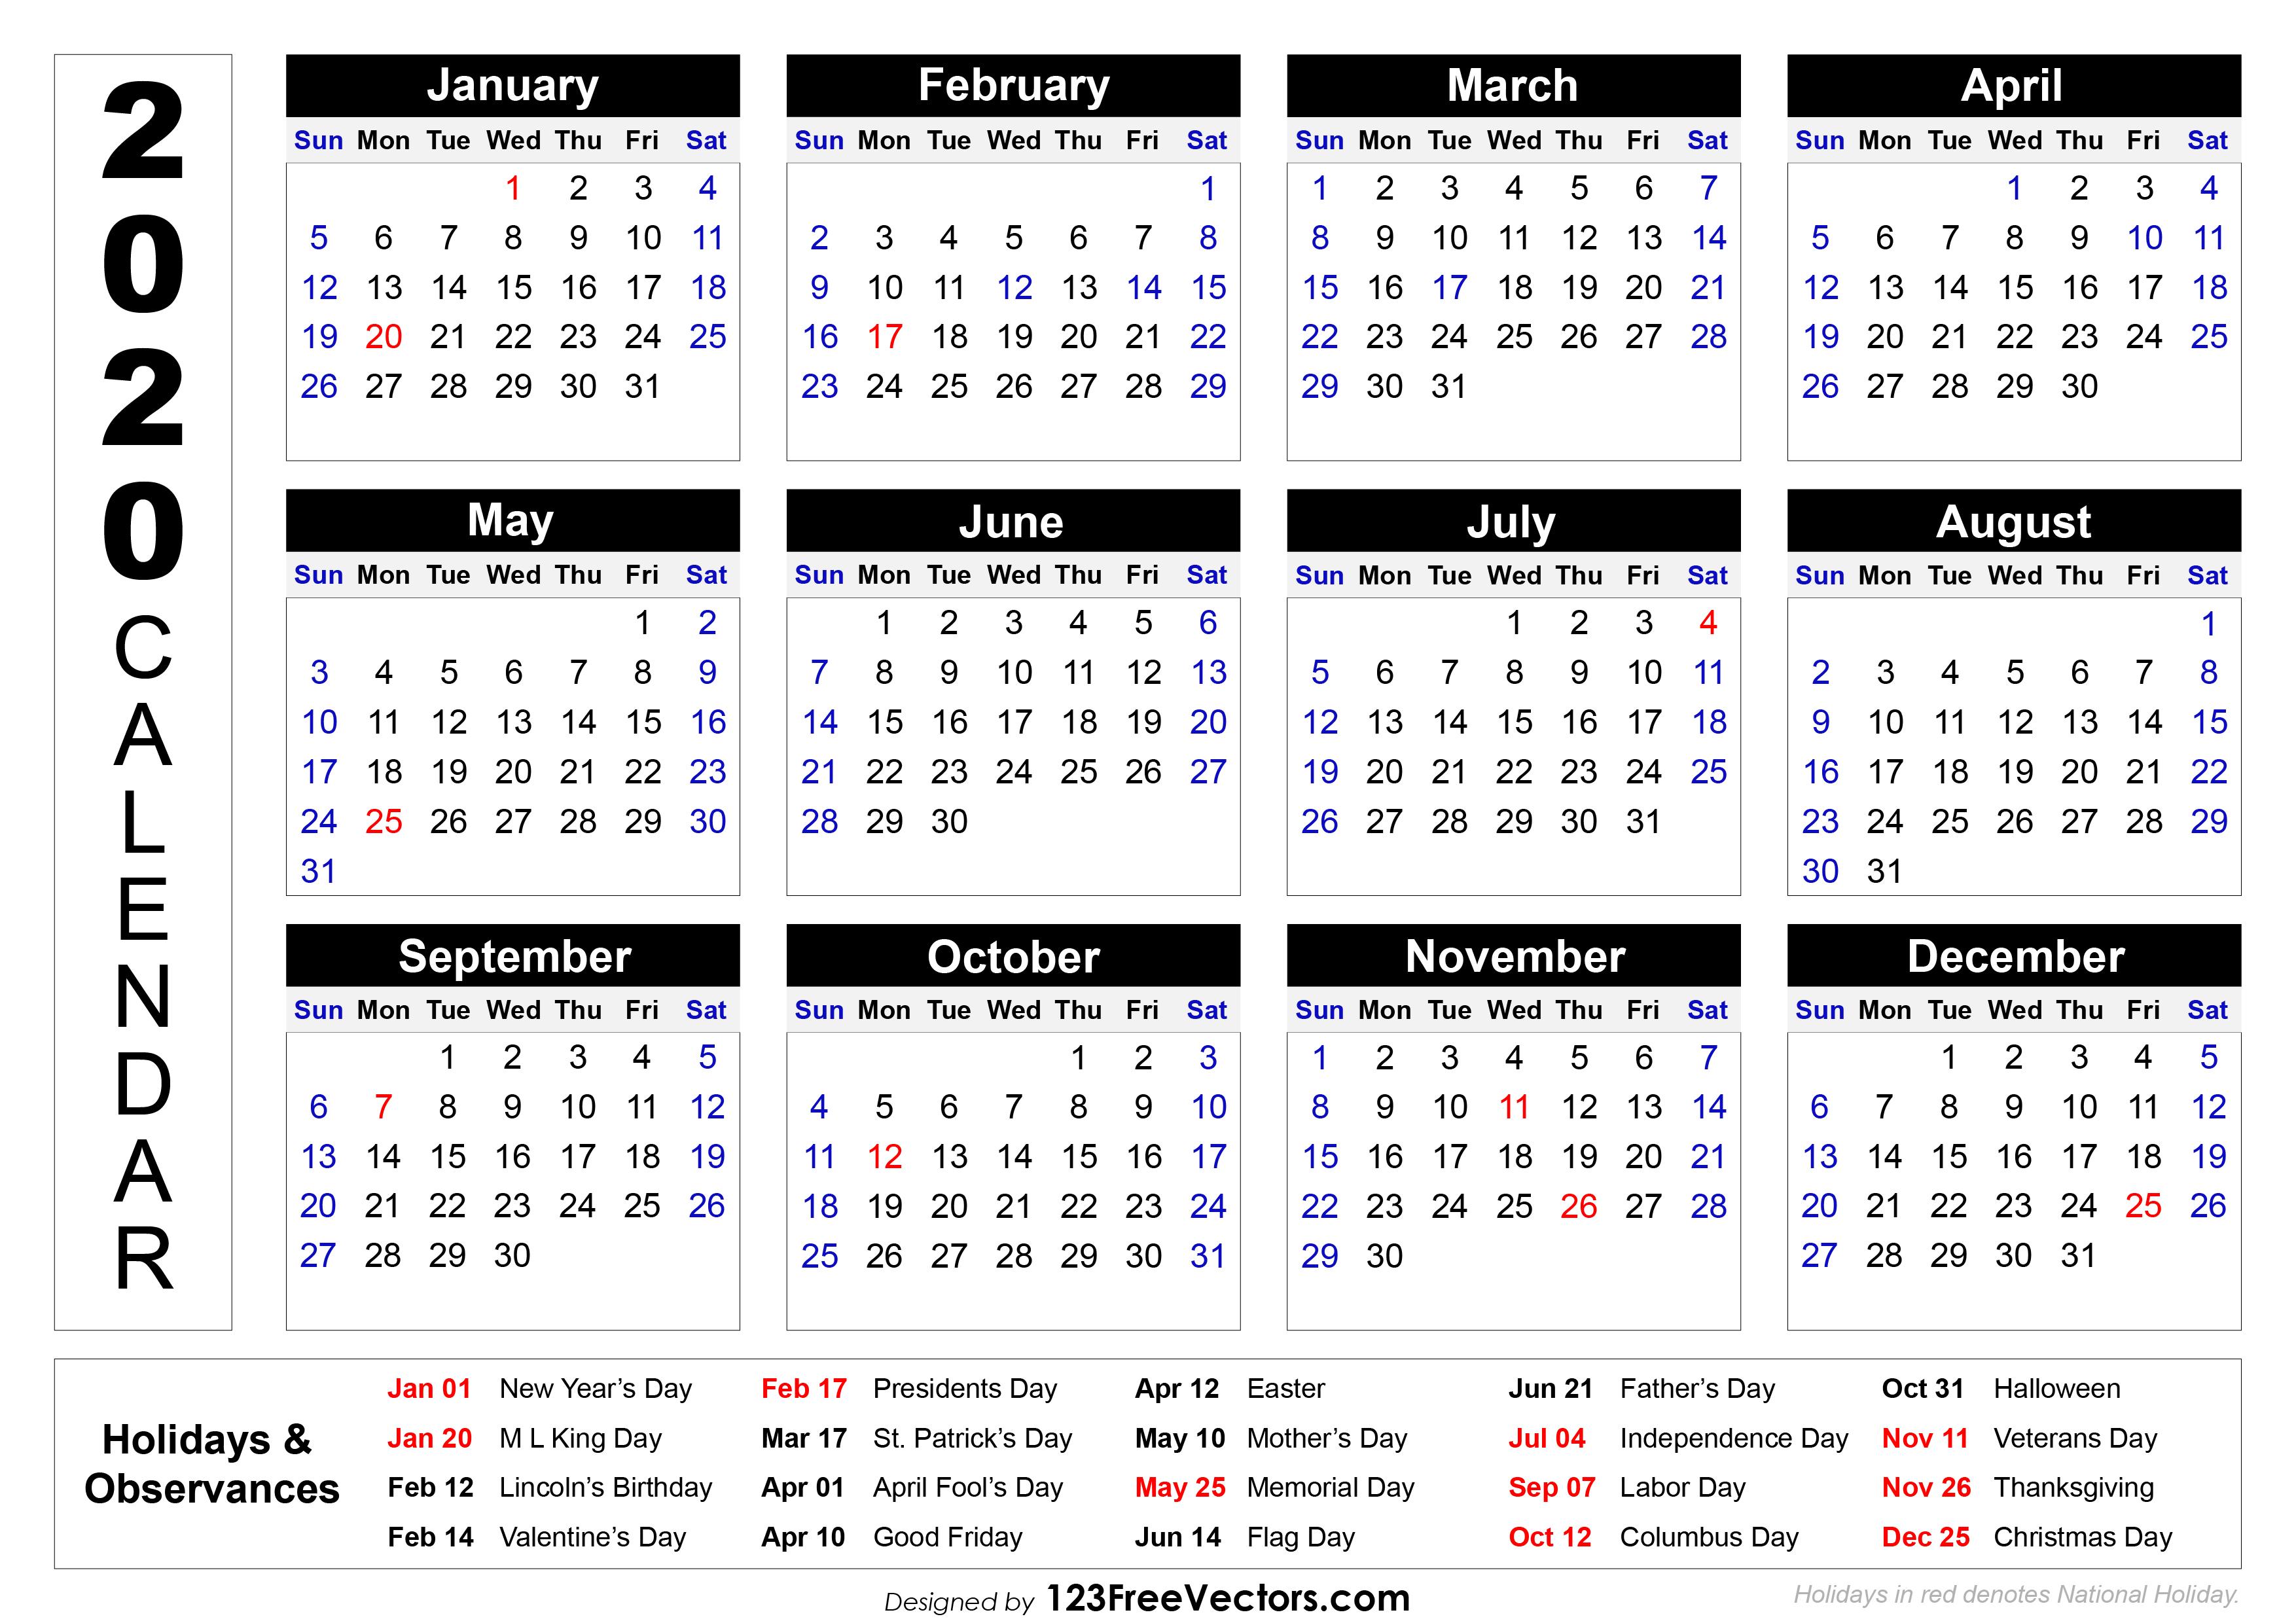 2020 Printable Calendar With Holidays within 2020 Calendar With Holidays